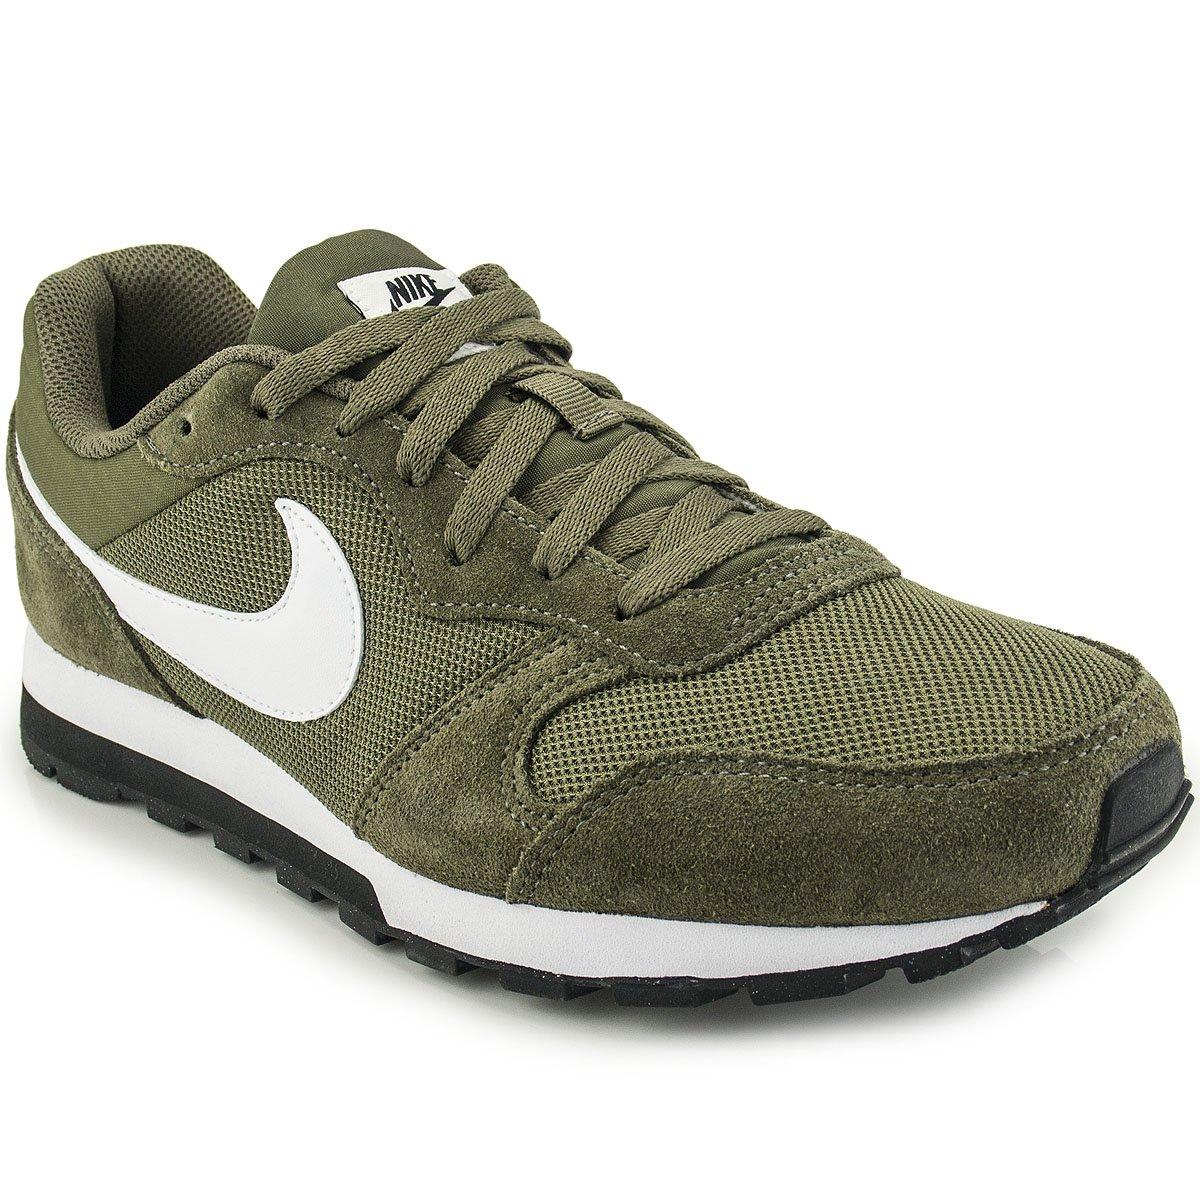 547d46599da Tênis Nike MD Runner 2 749794